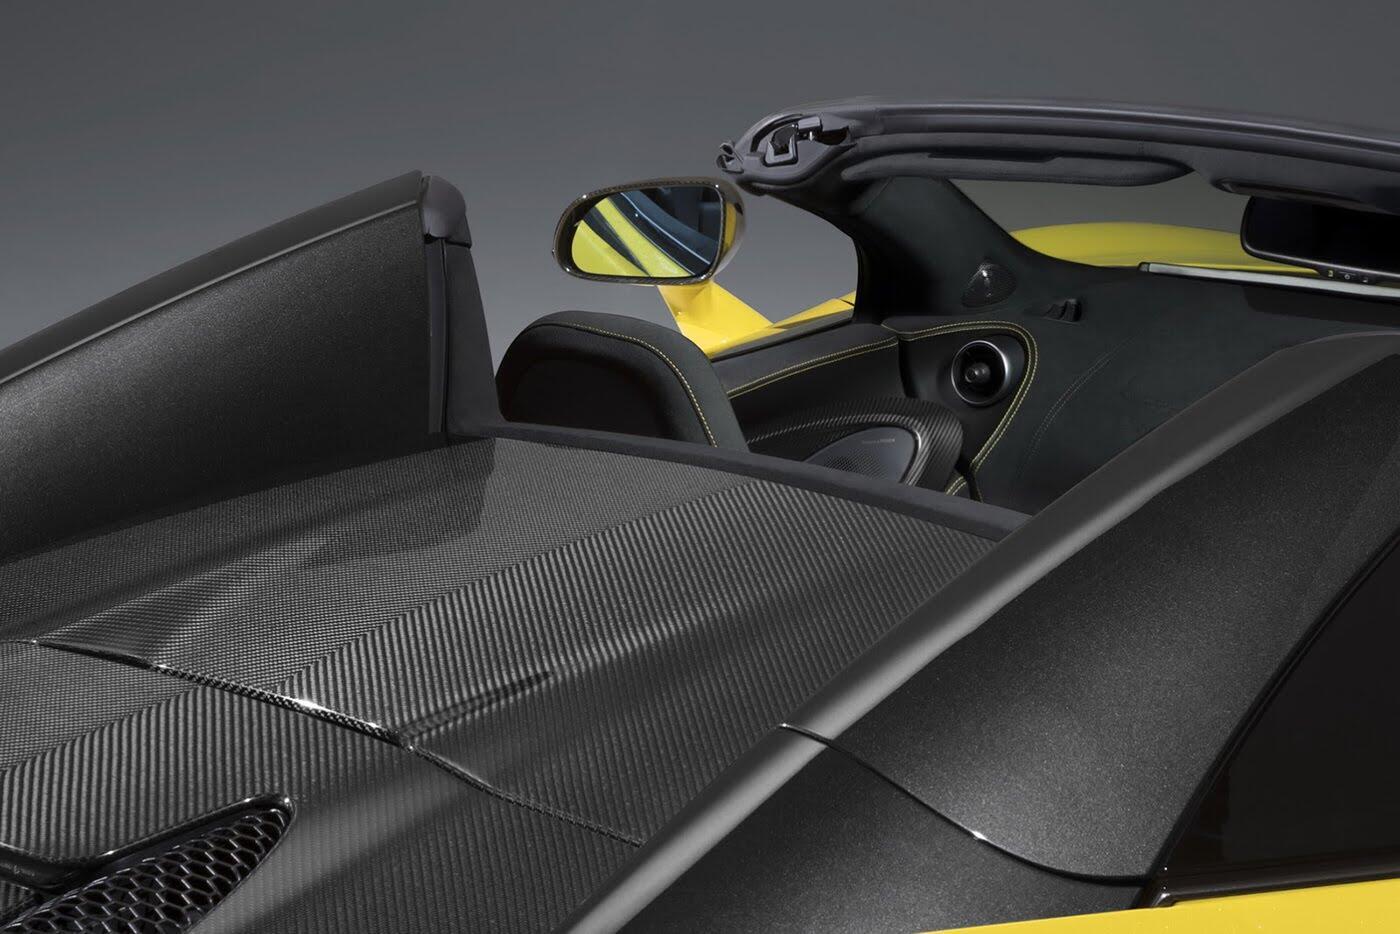 Siêu xe McLaren 570S Spider sắp ra mắt - Hình 13